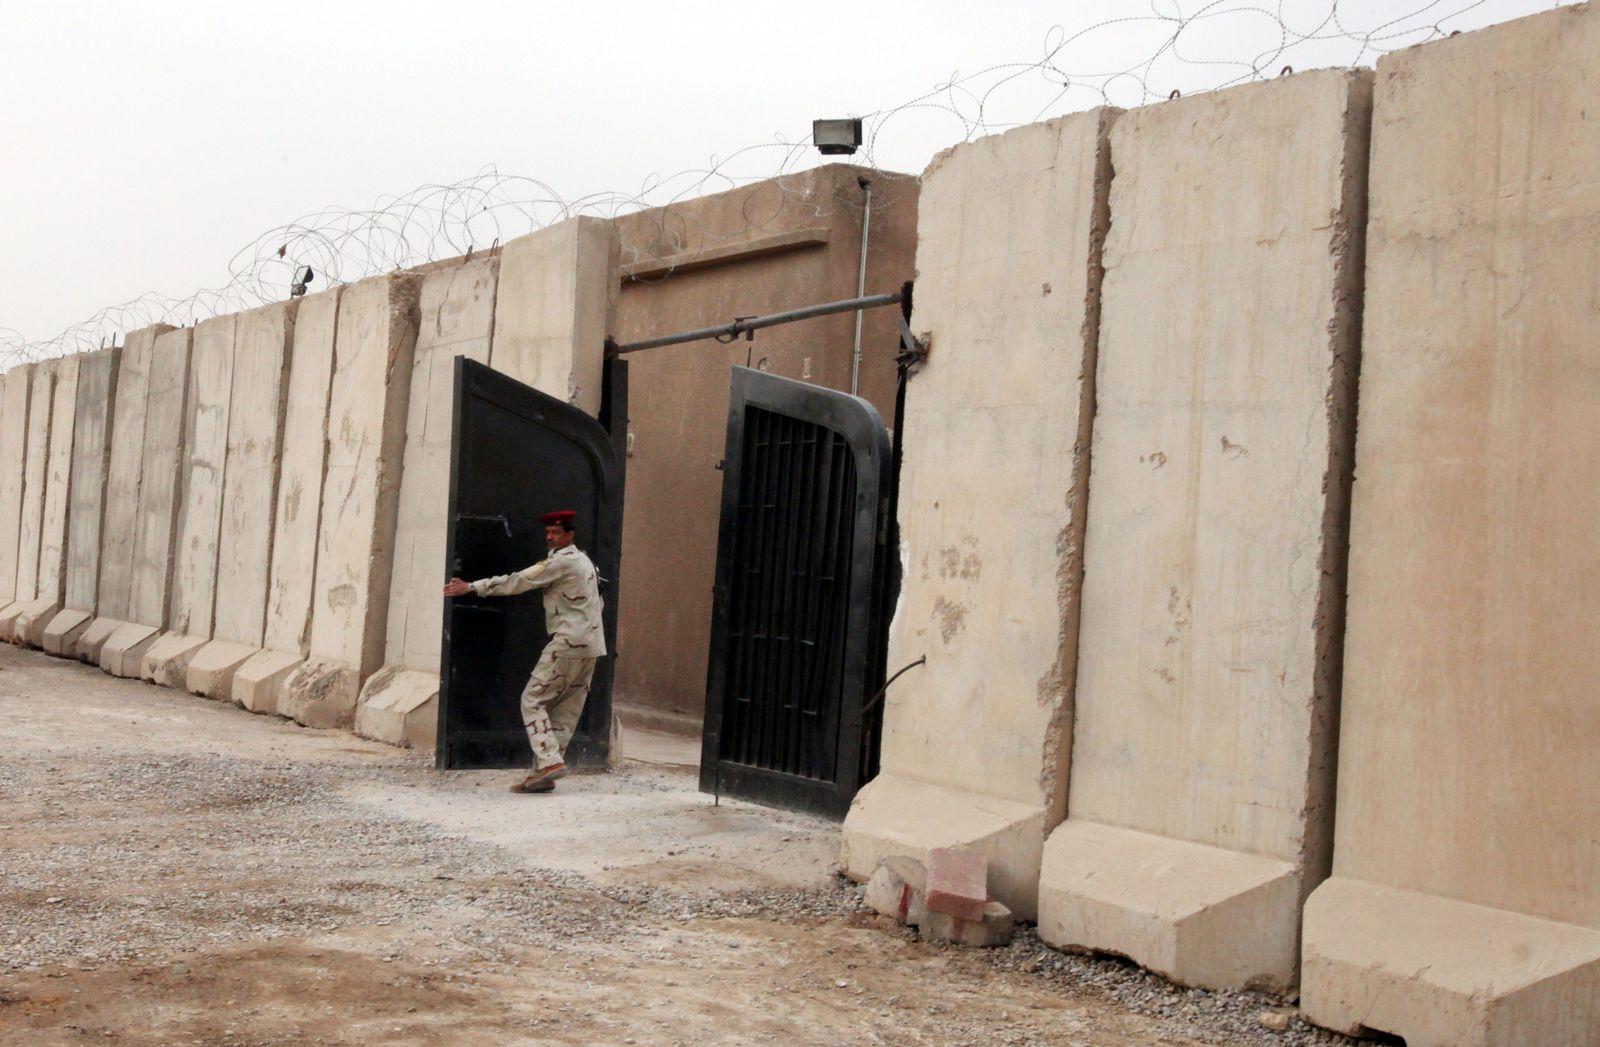 Irak/ Gefängnis Bagdad